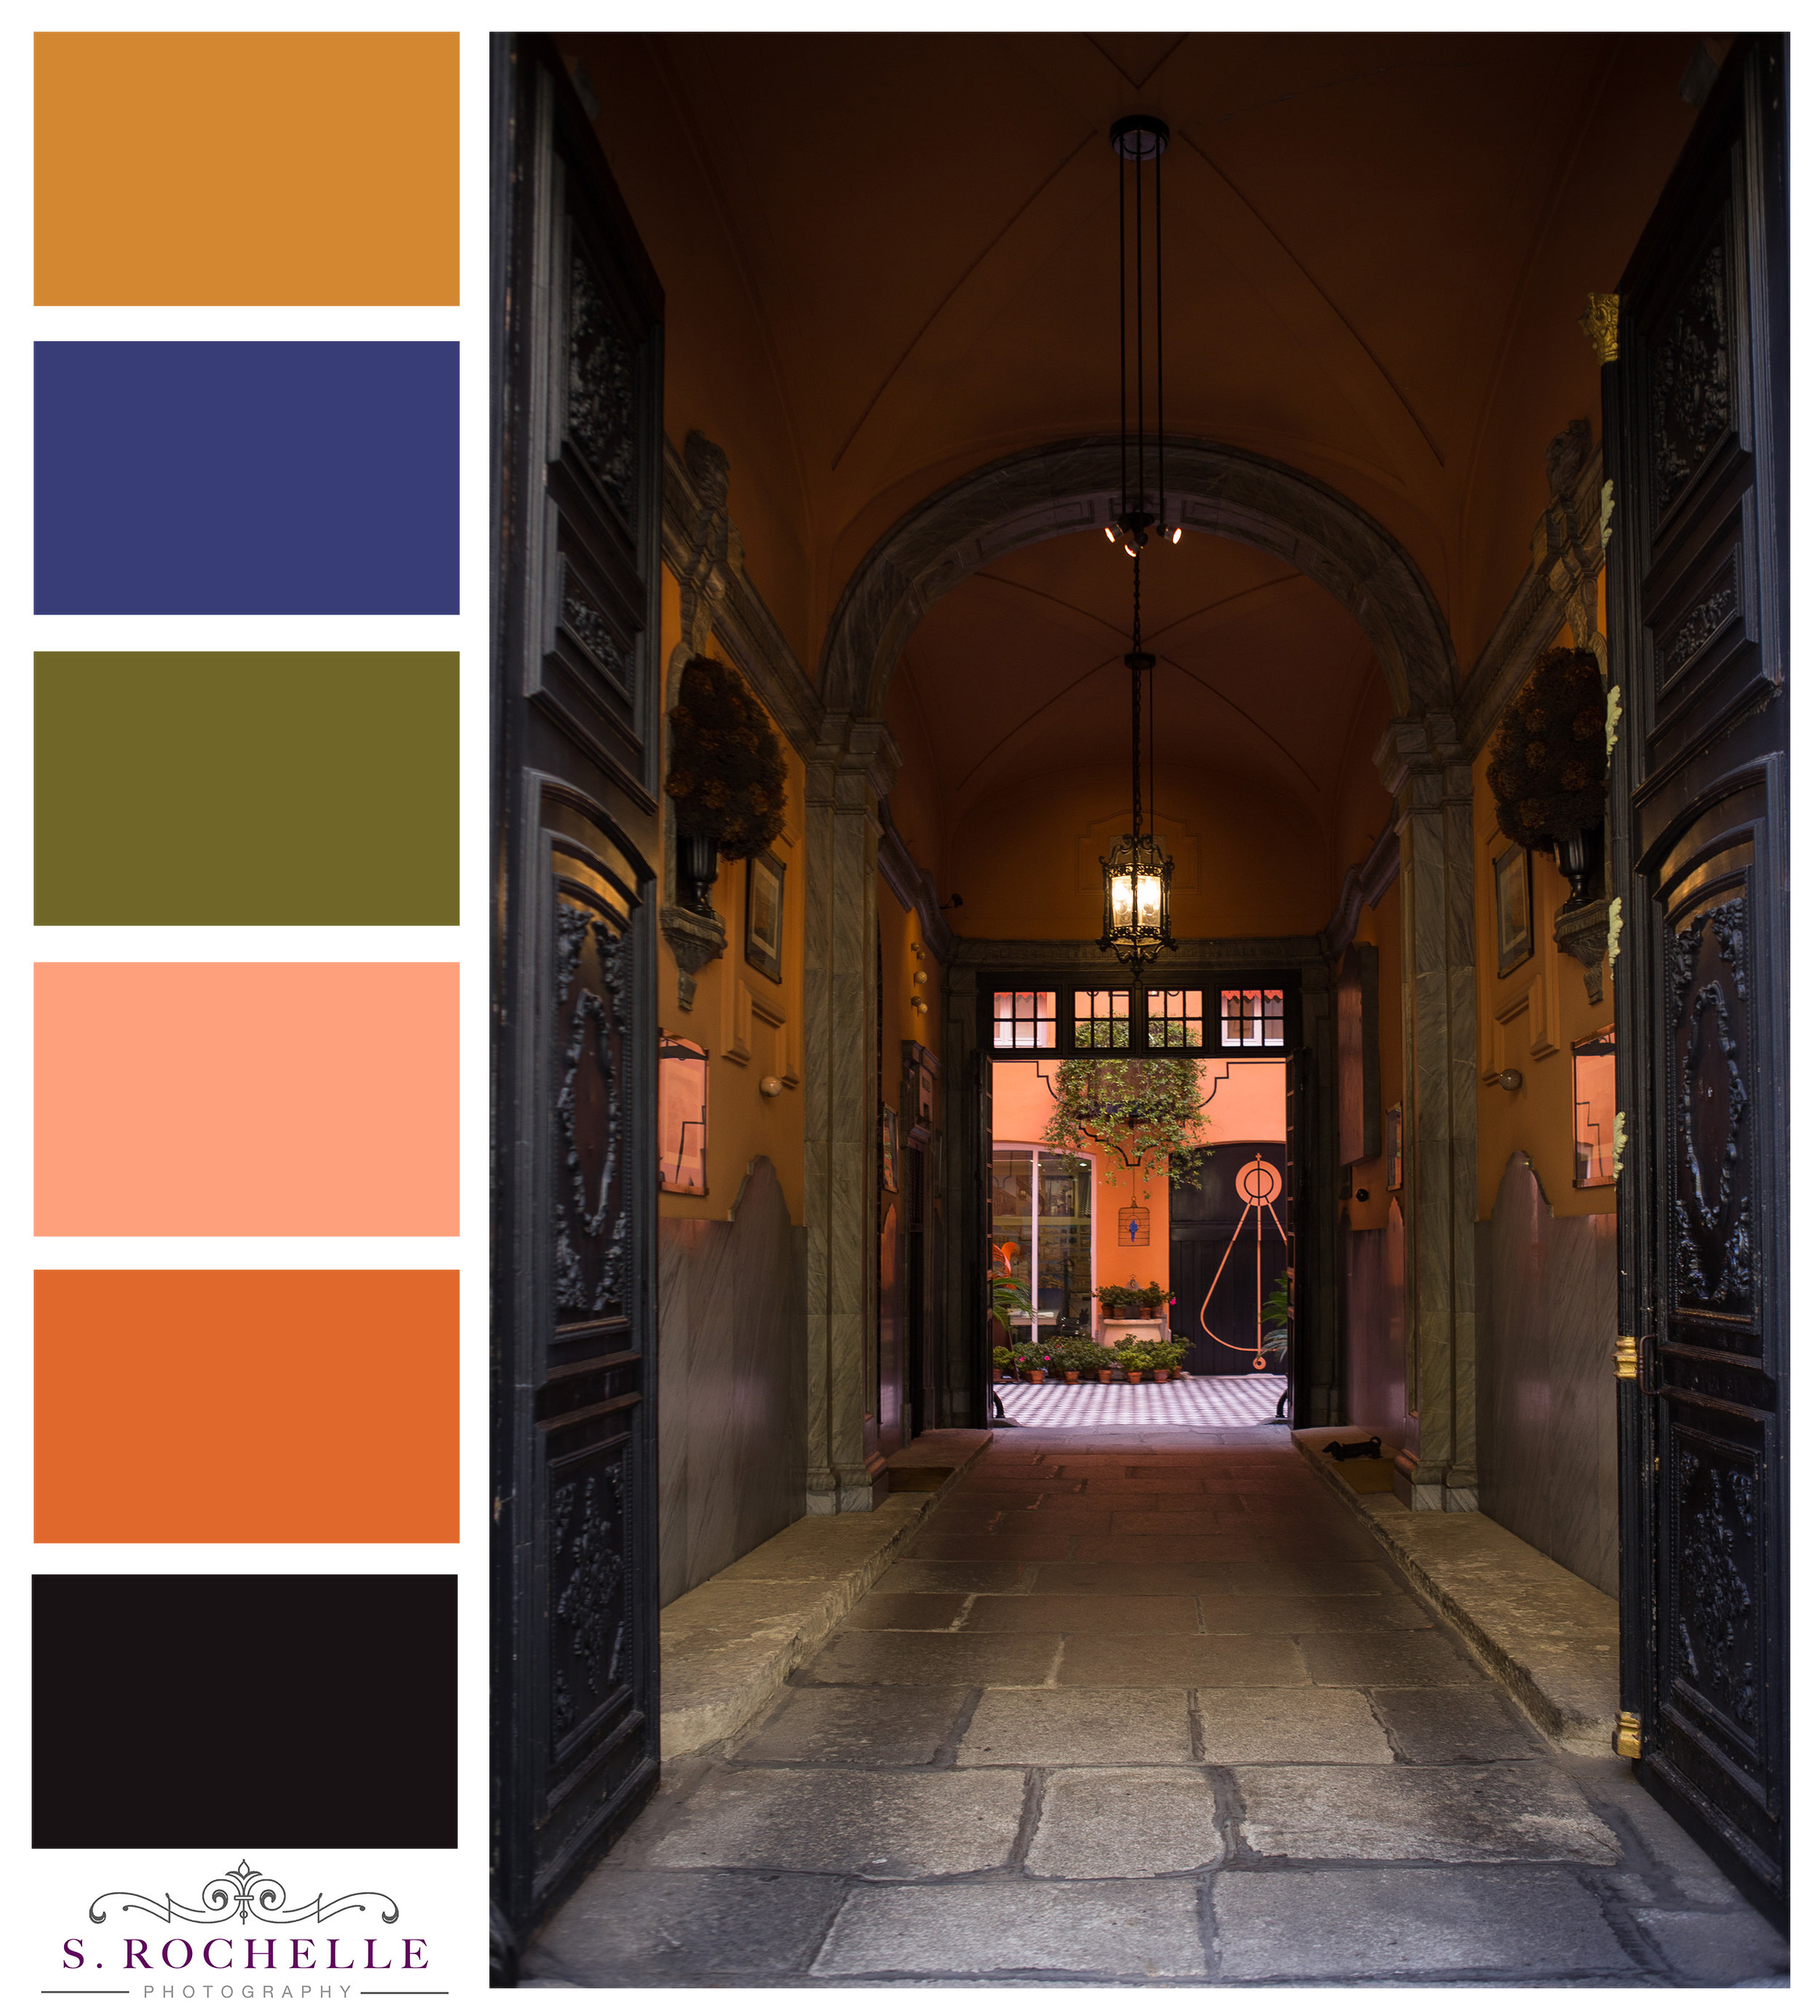 MadridCourtyard_S_Rochelle_Photography_20170227_IMG_3235_ColorPalatte.jpg